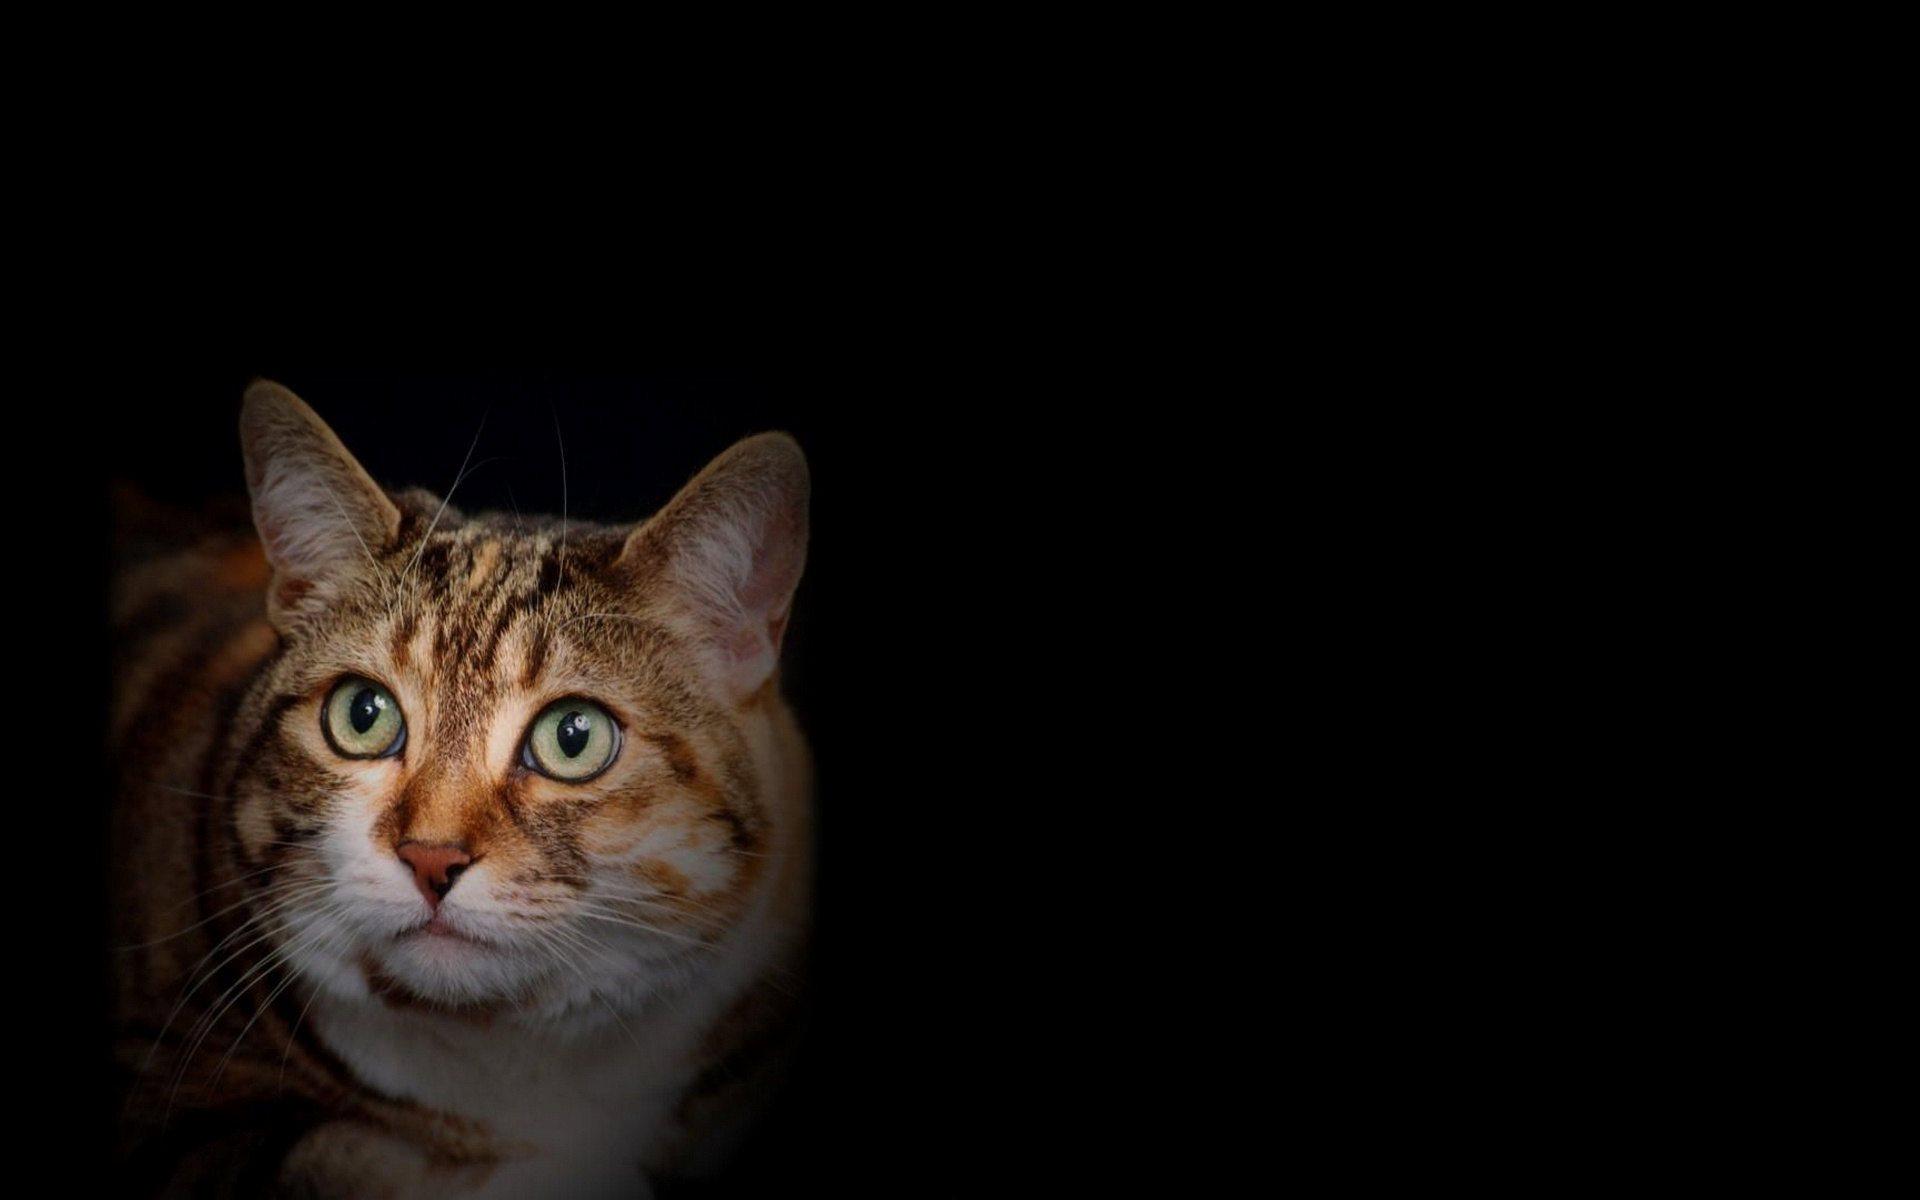 light green eyes cat wallpaper background